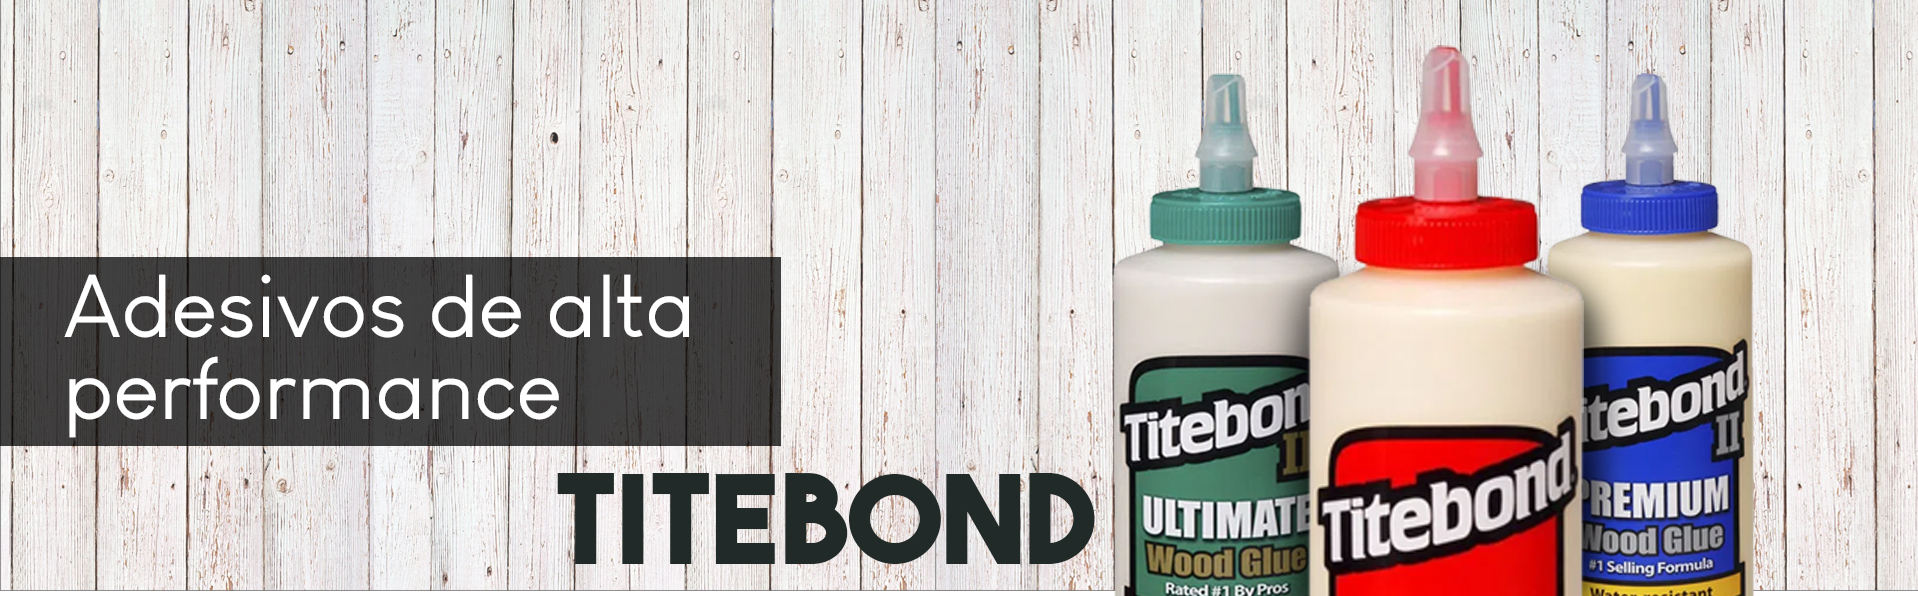 Banner Titebond